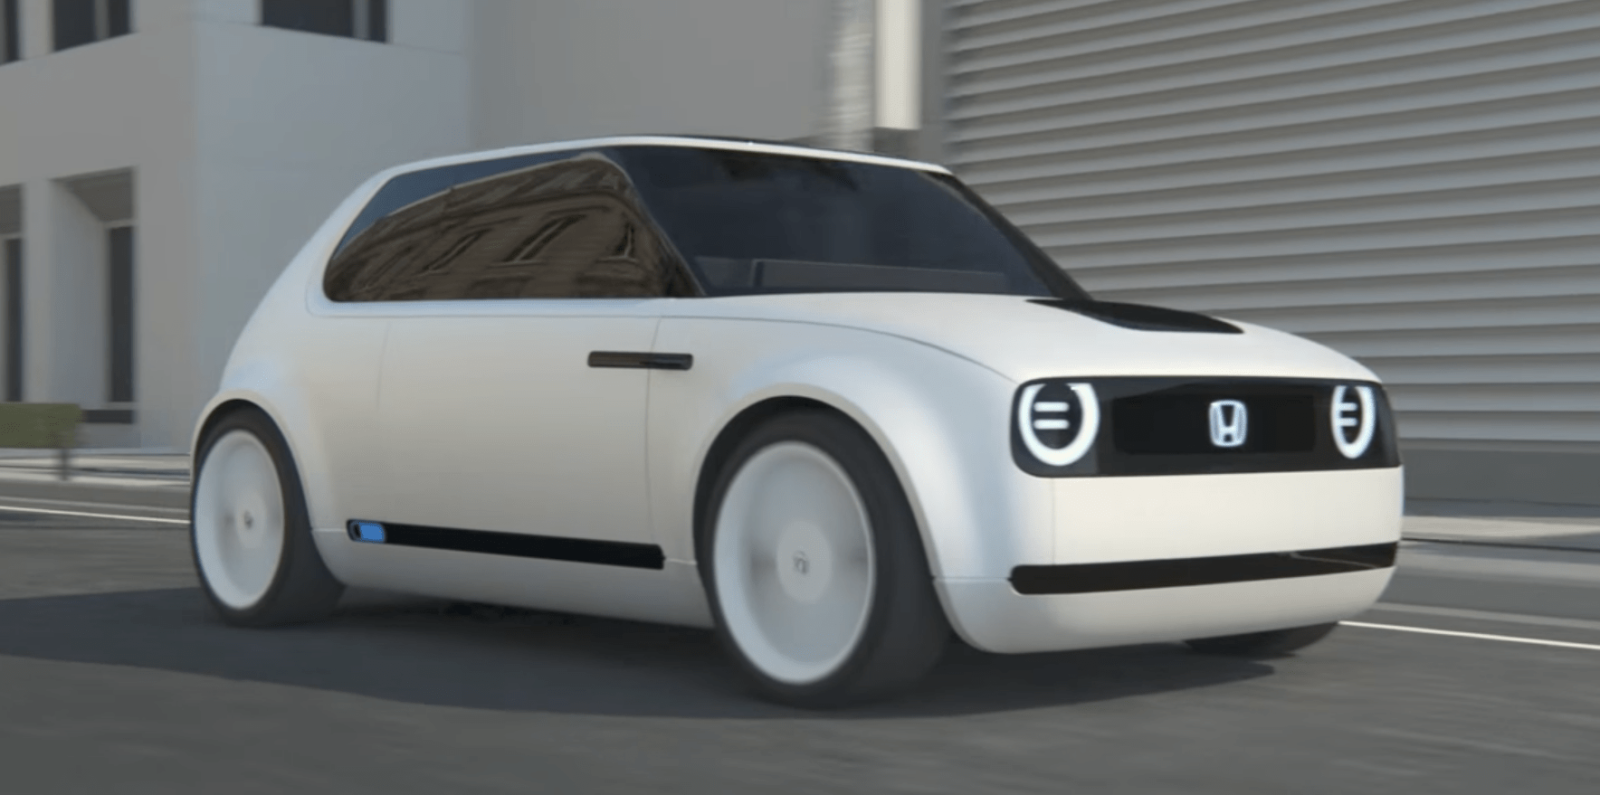 83 Concept of Honda Urban 2020 Reviews by Honda Urban 2020